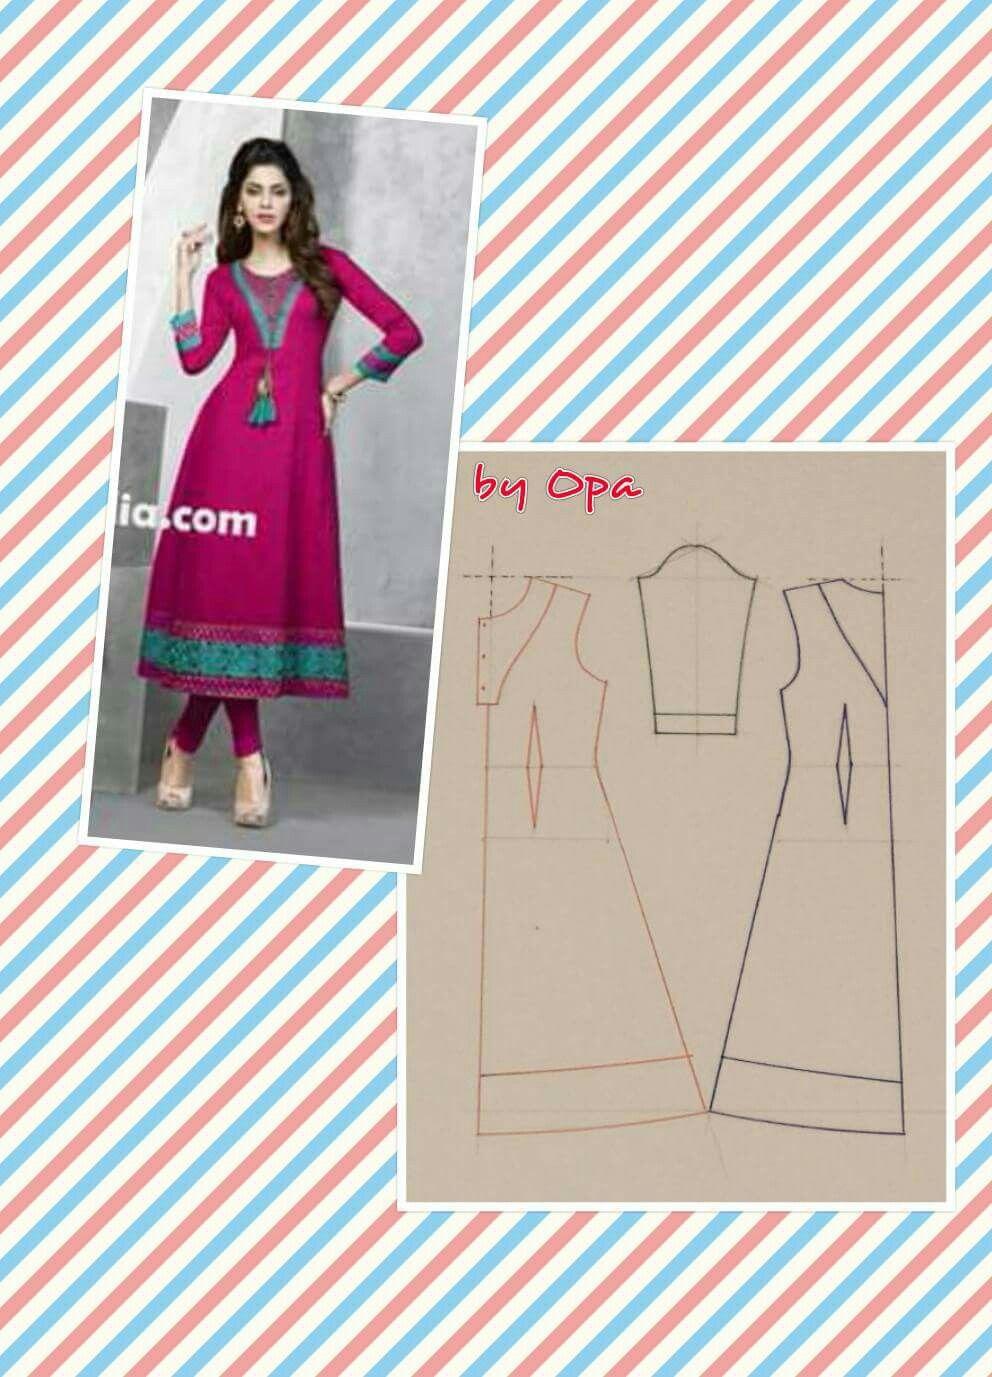 Pin de yohana en gaun   Pinterest   Costura, Alta costura y Falda